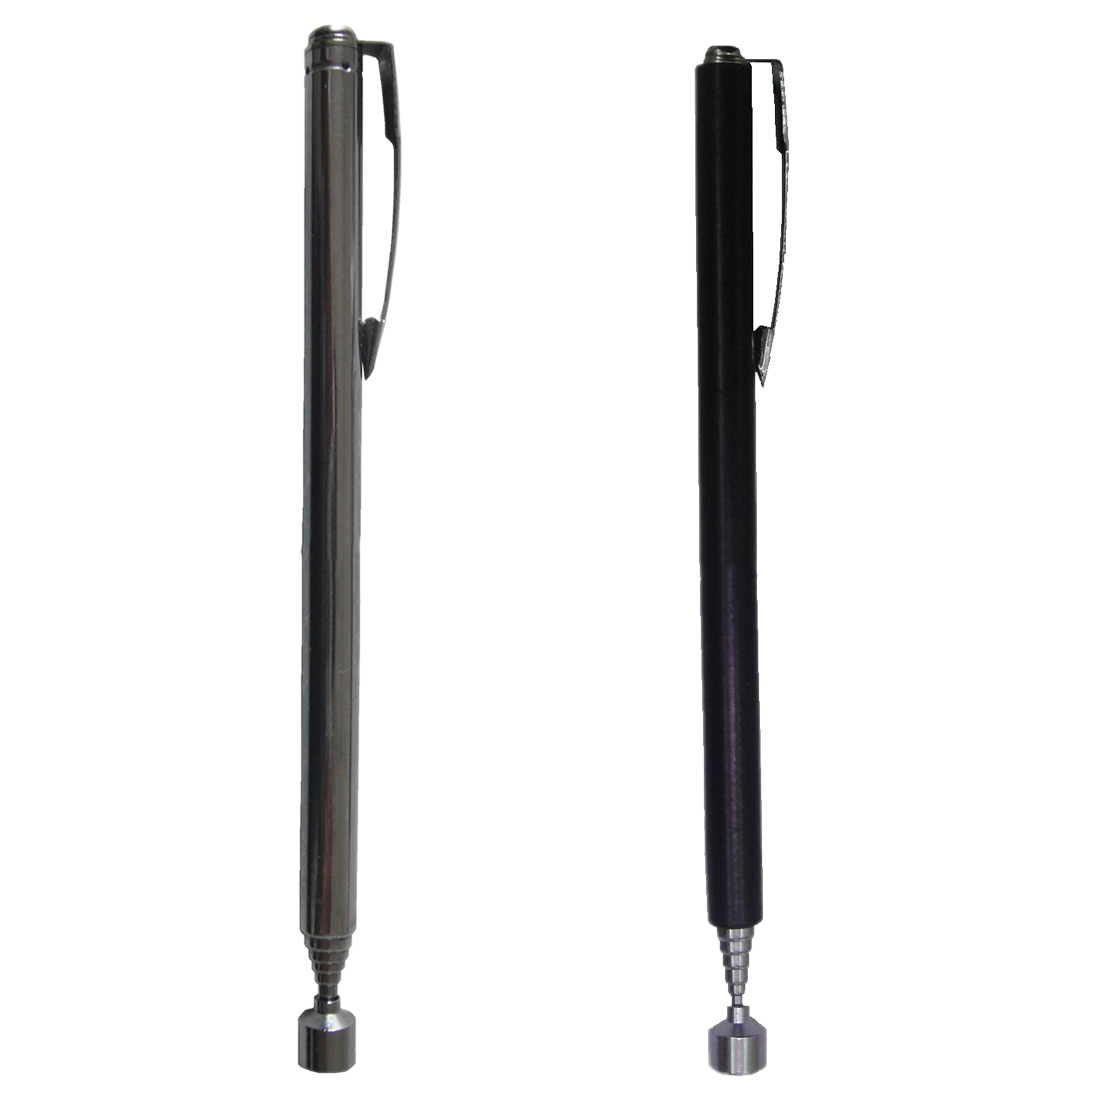 1pcs Black Portable Adjustable Pocket Magnetic Pick Up Pen Tools Rod Stick Extending Magnet Telescopic Easy Rod Handheld Tool